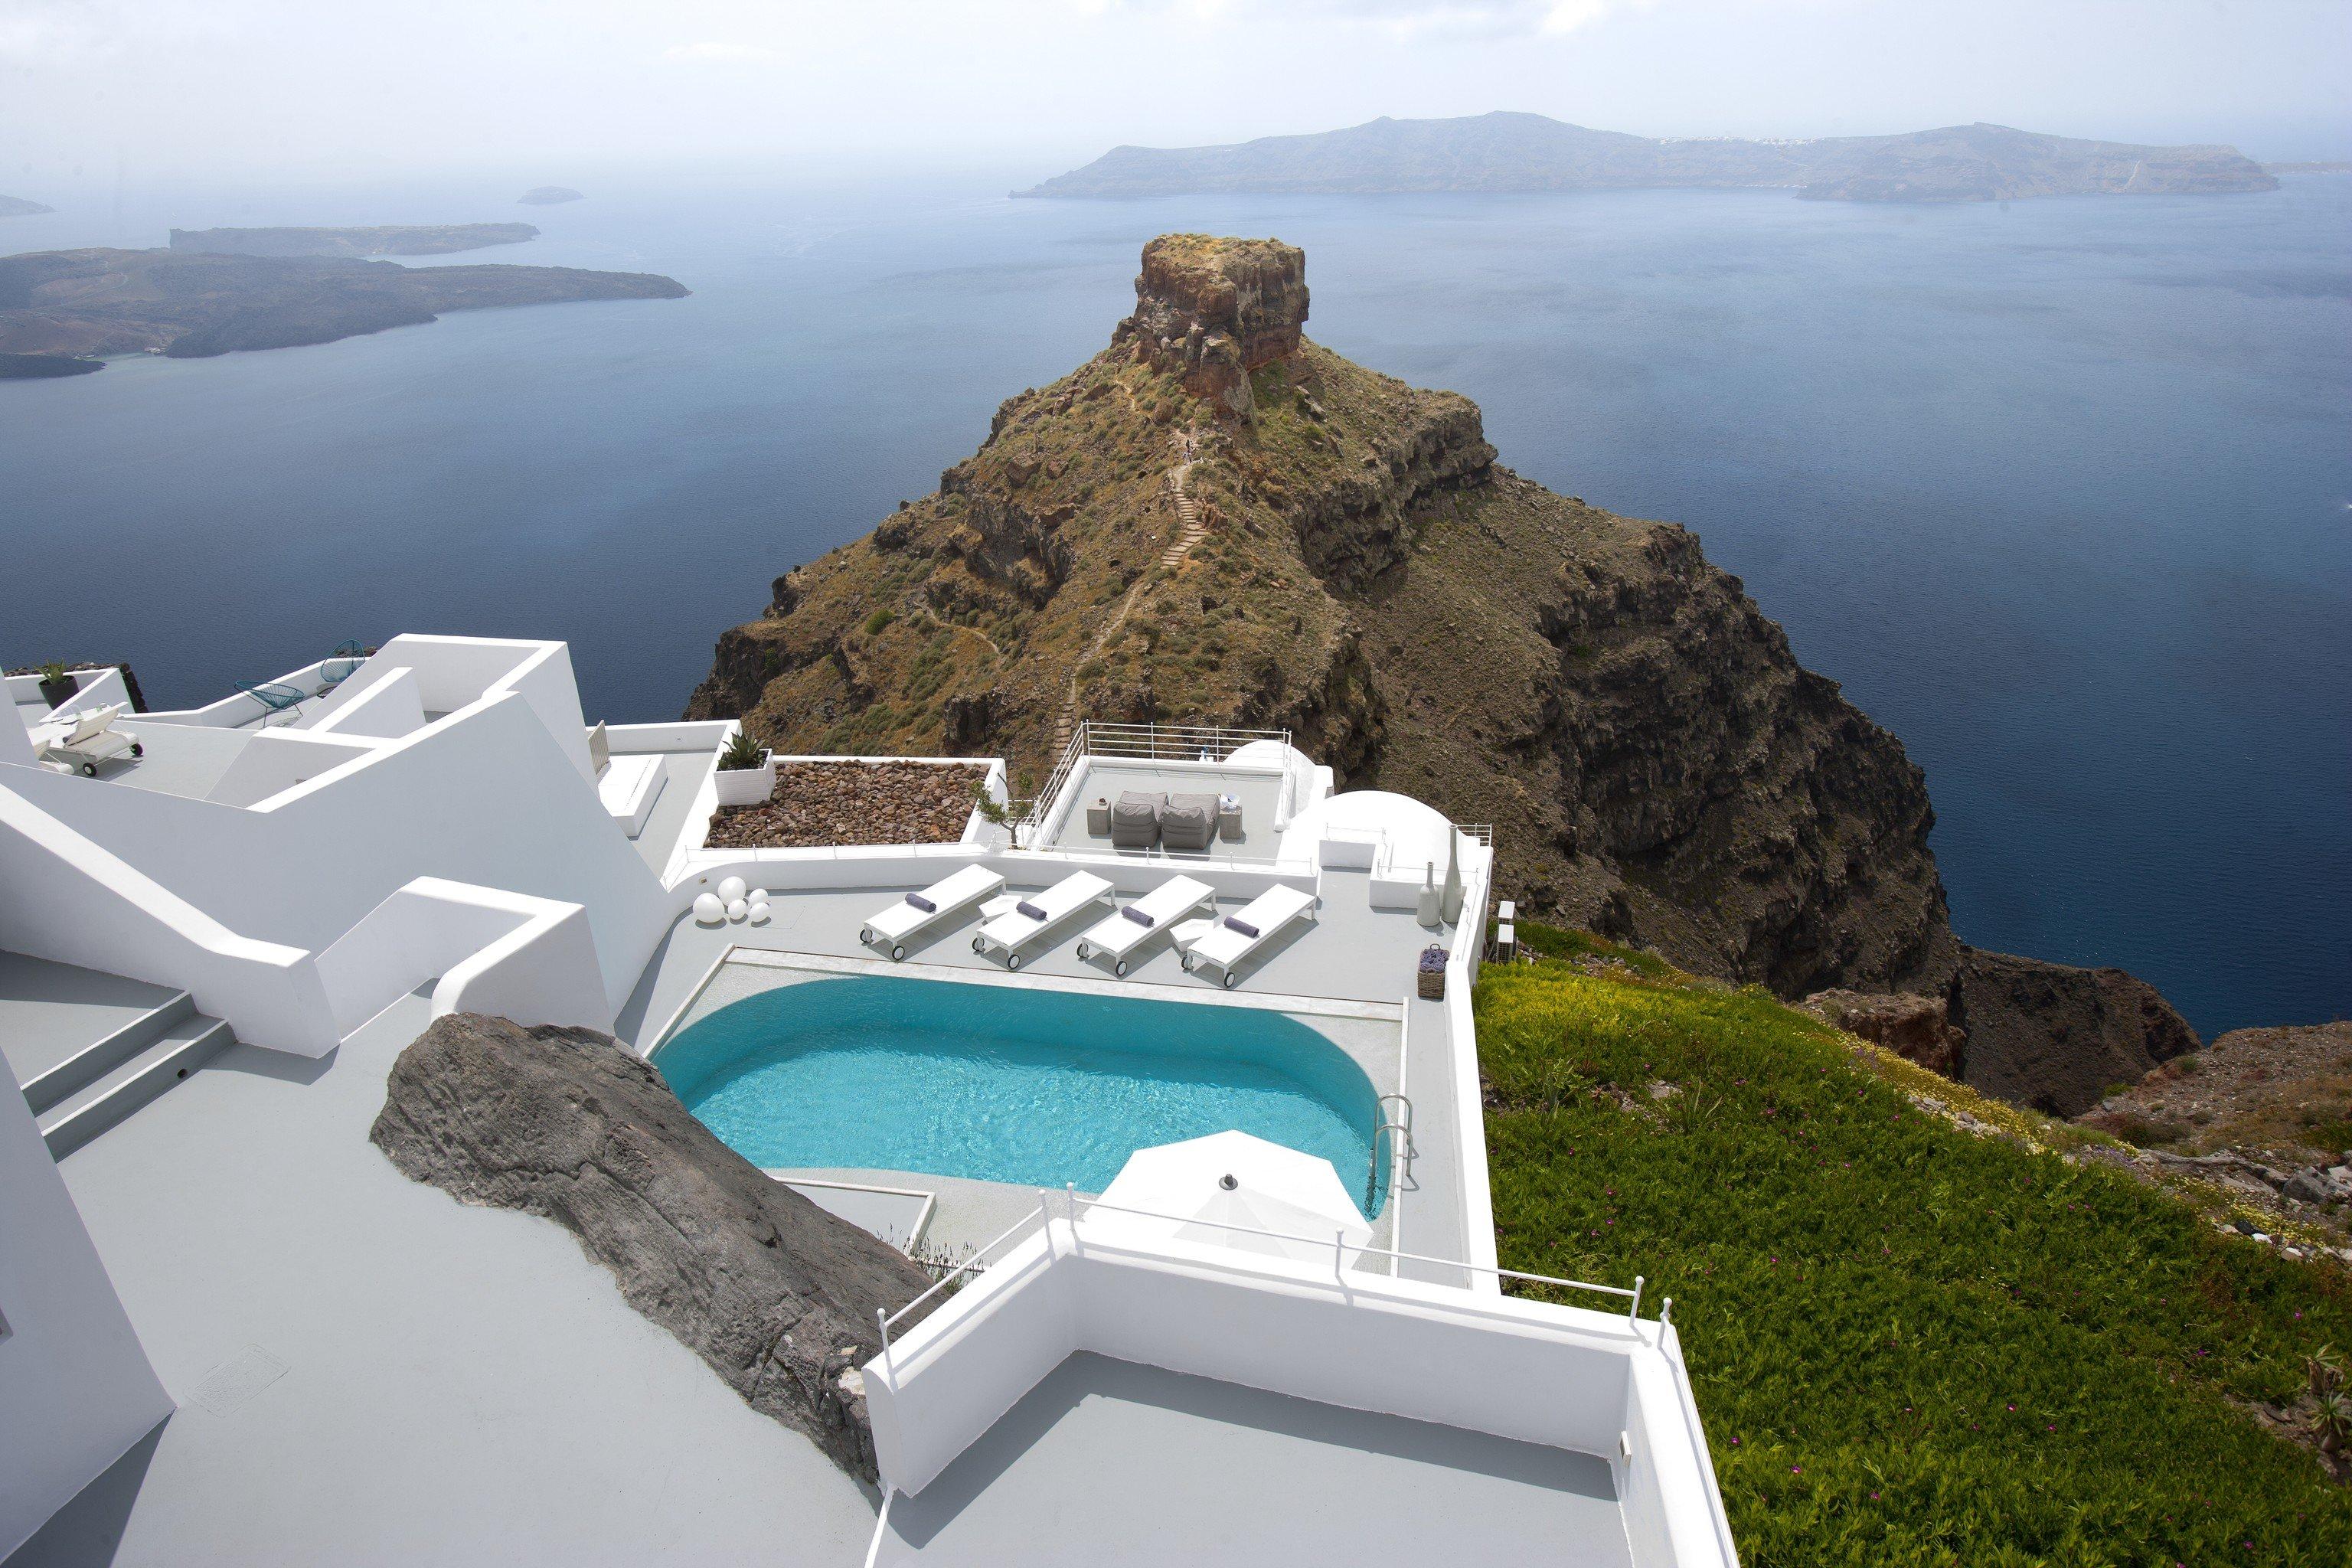 Greece Hotels Luxury Travel Santorini outdoor grass Nature mountain promontory Sea white sky tourism